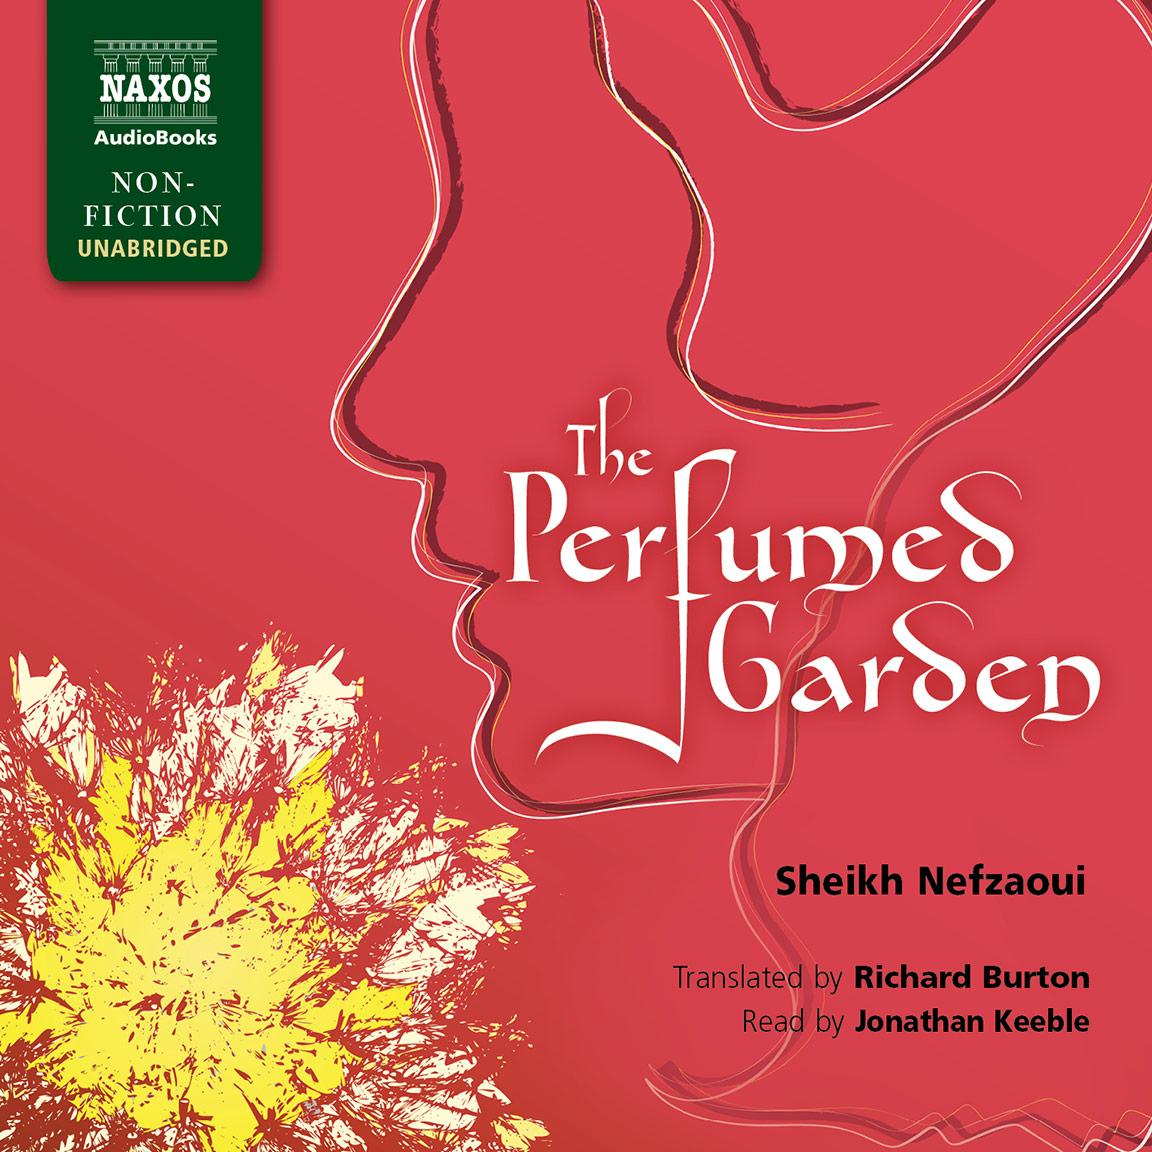 Perfumed Garden